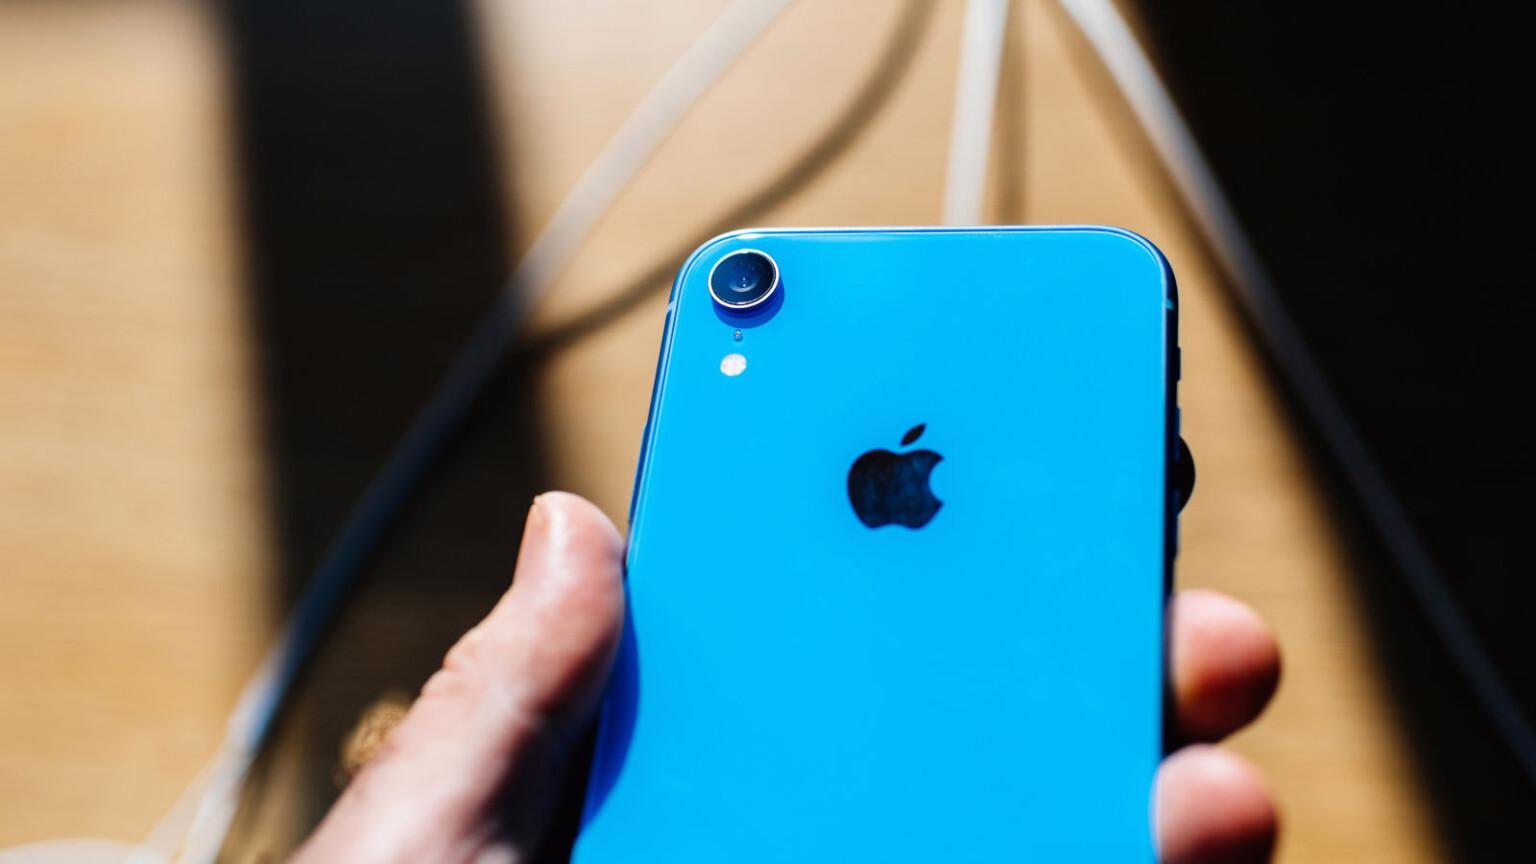 Rumors Claim iPhone SE 3 Is Coming in April 2021 | TechNadu